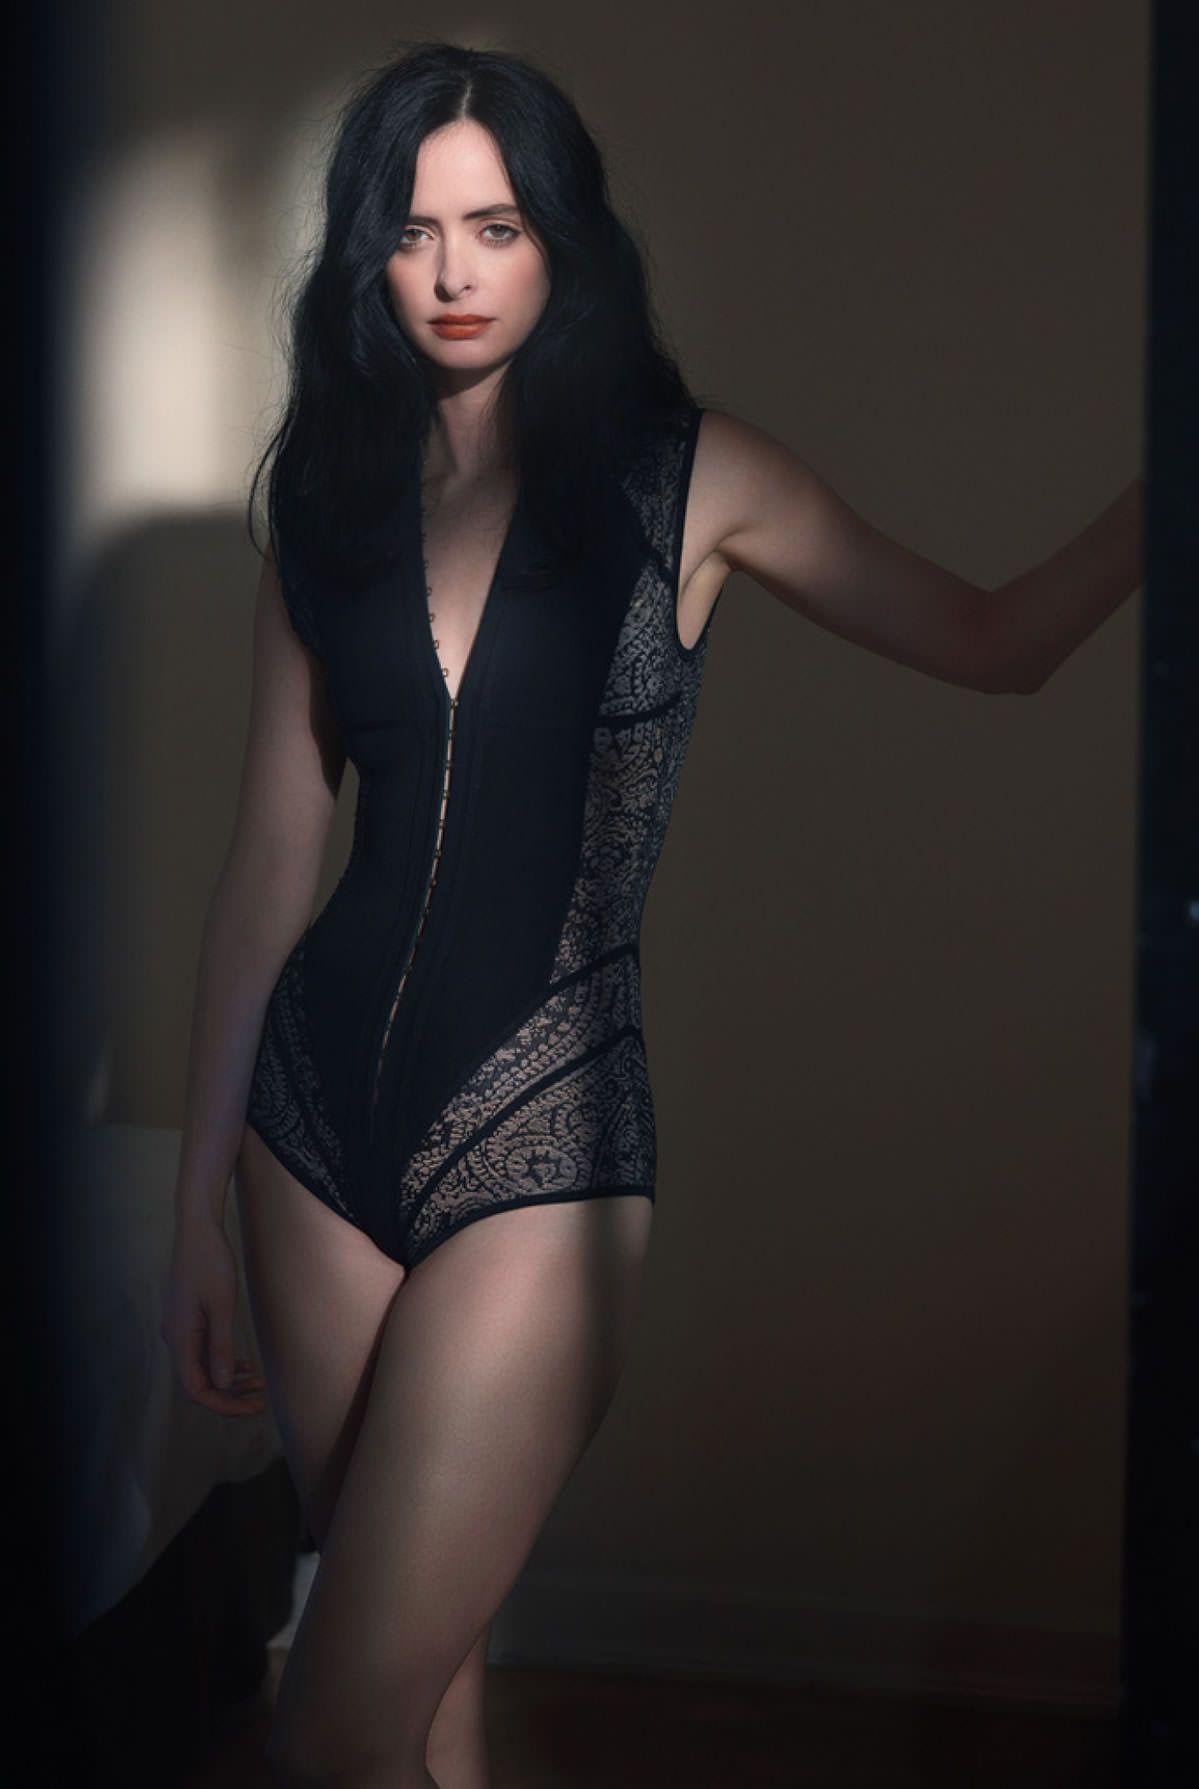 Erotica Krysten Ritter nude photos 2019